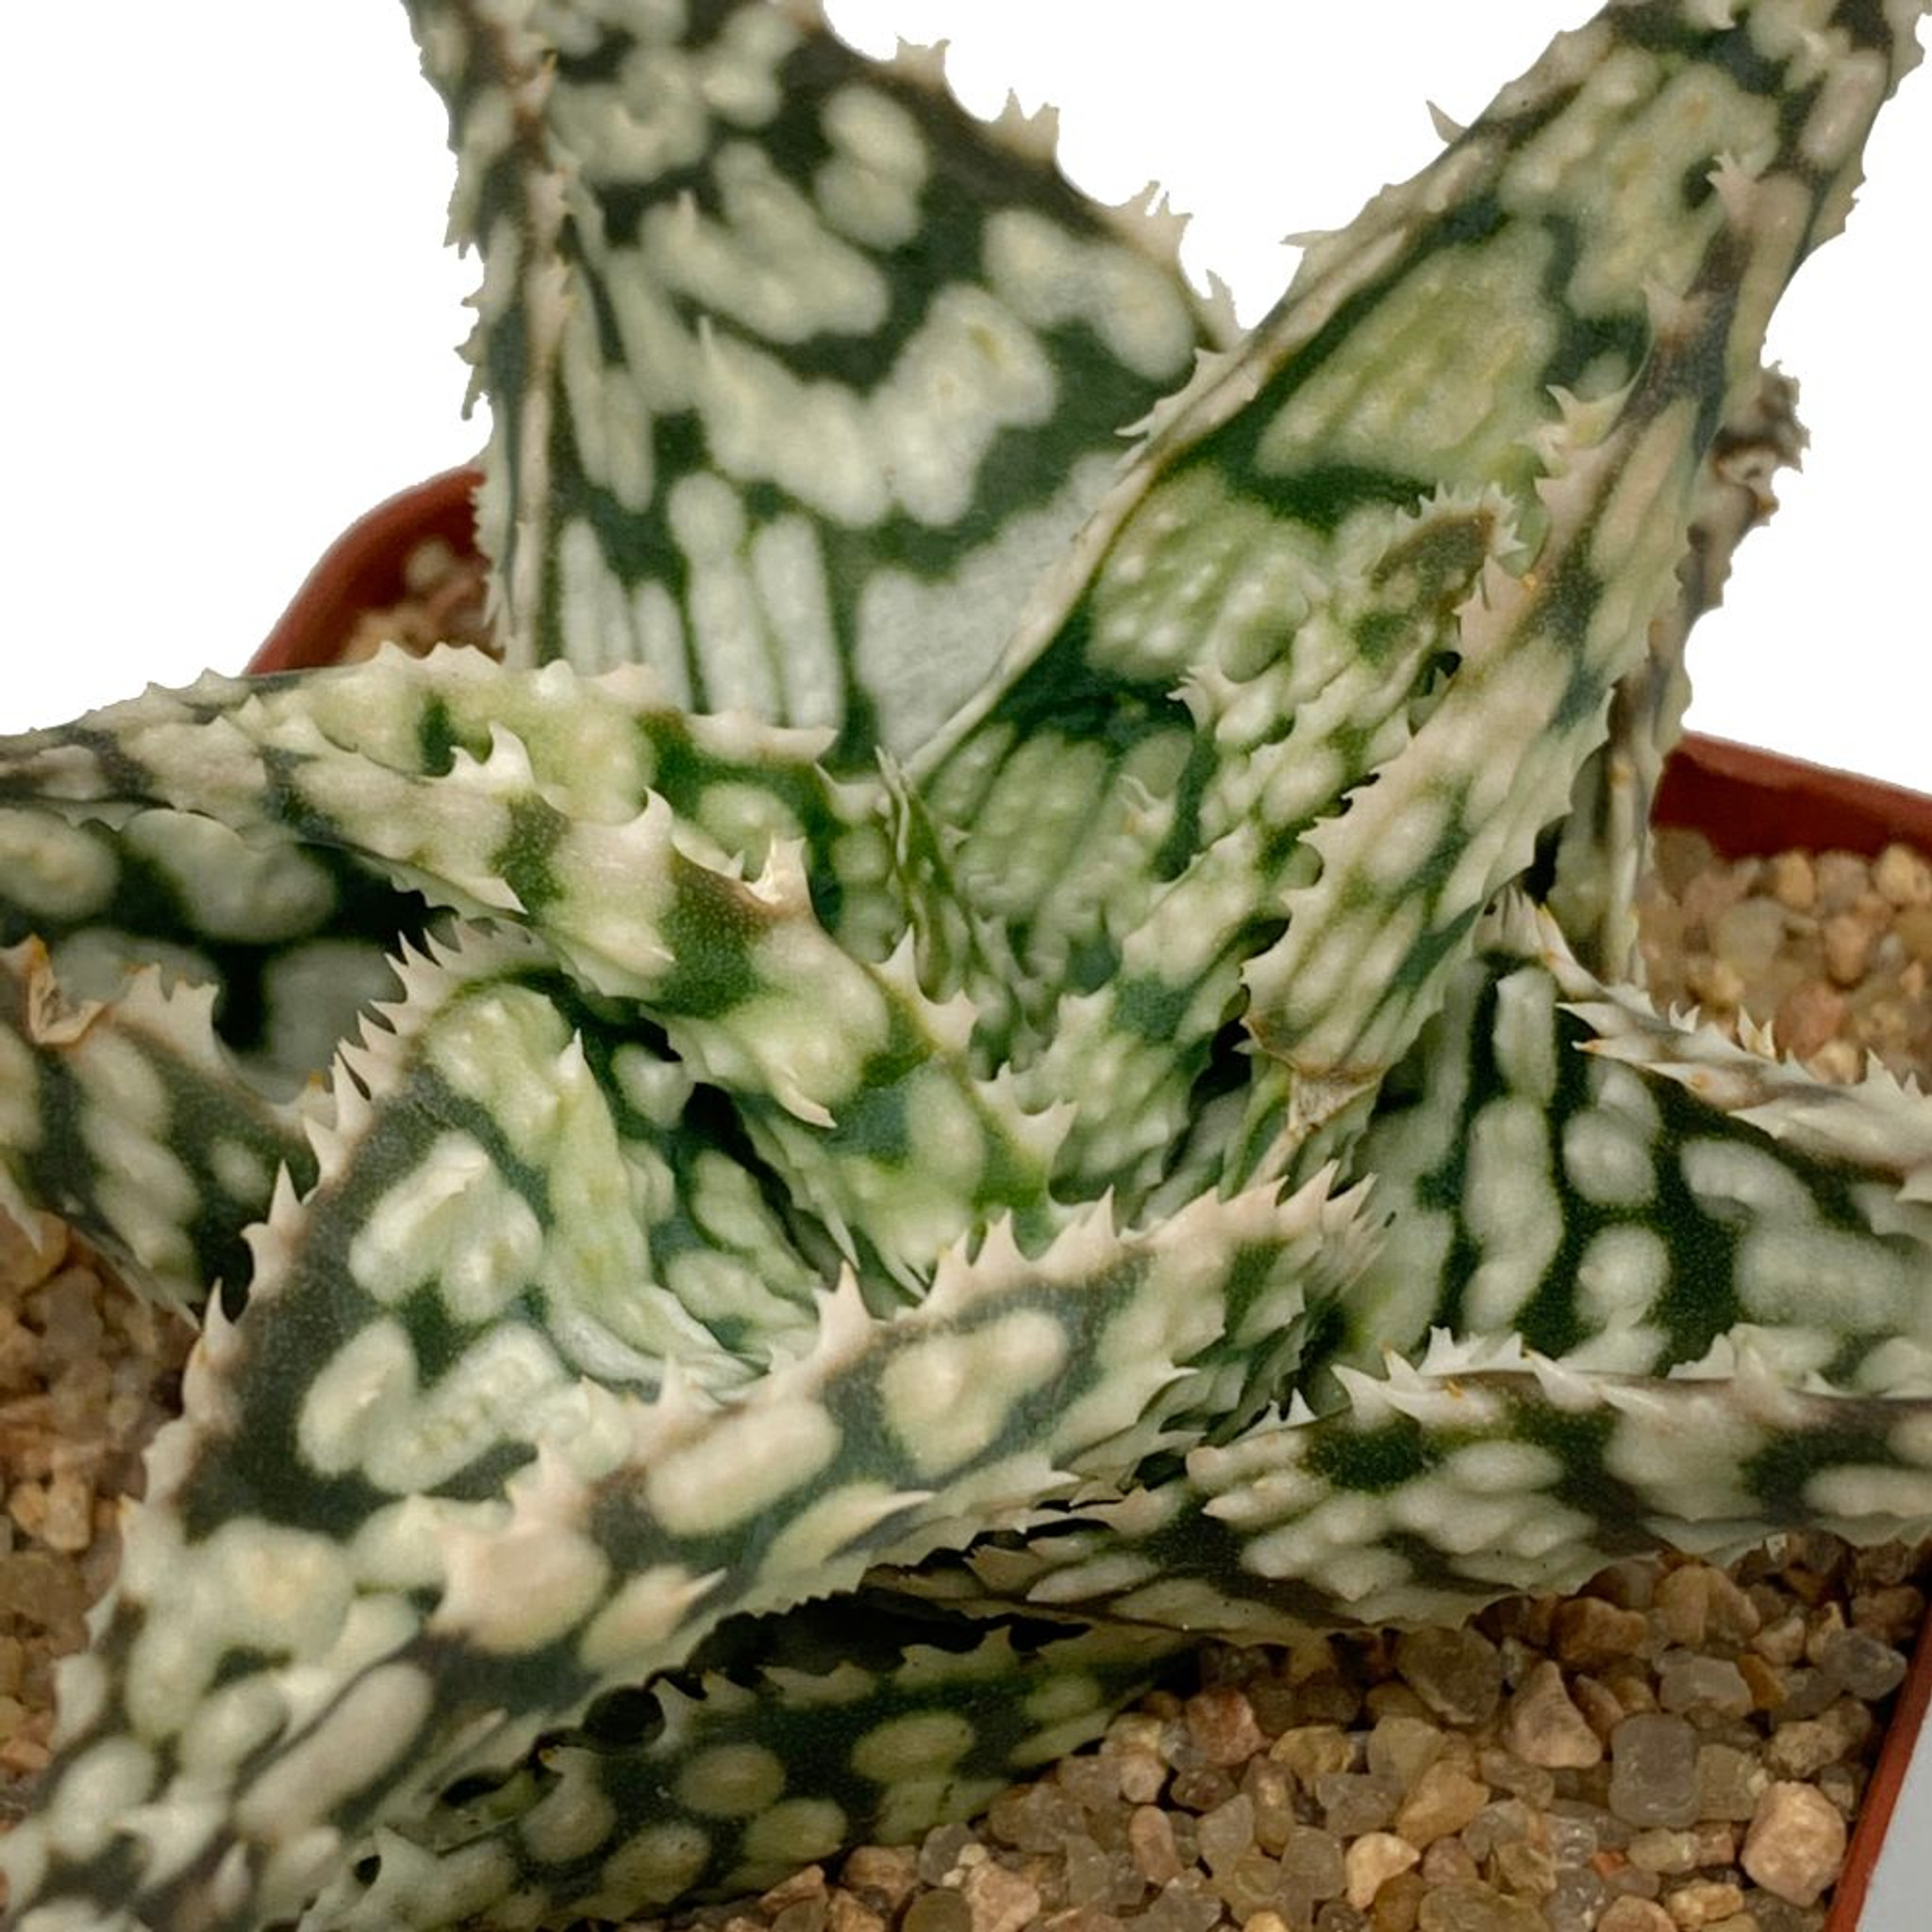 Aloe 'Snowstorm'